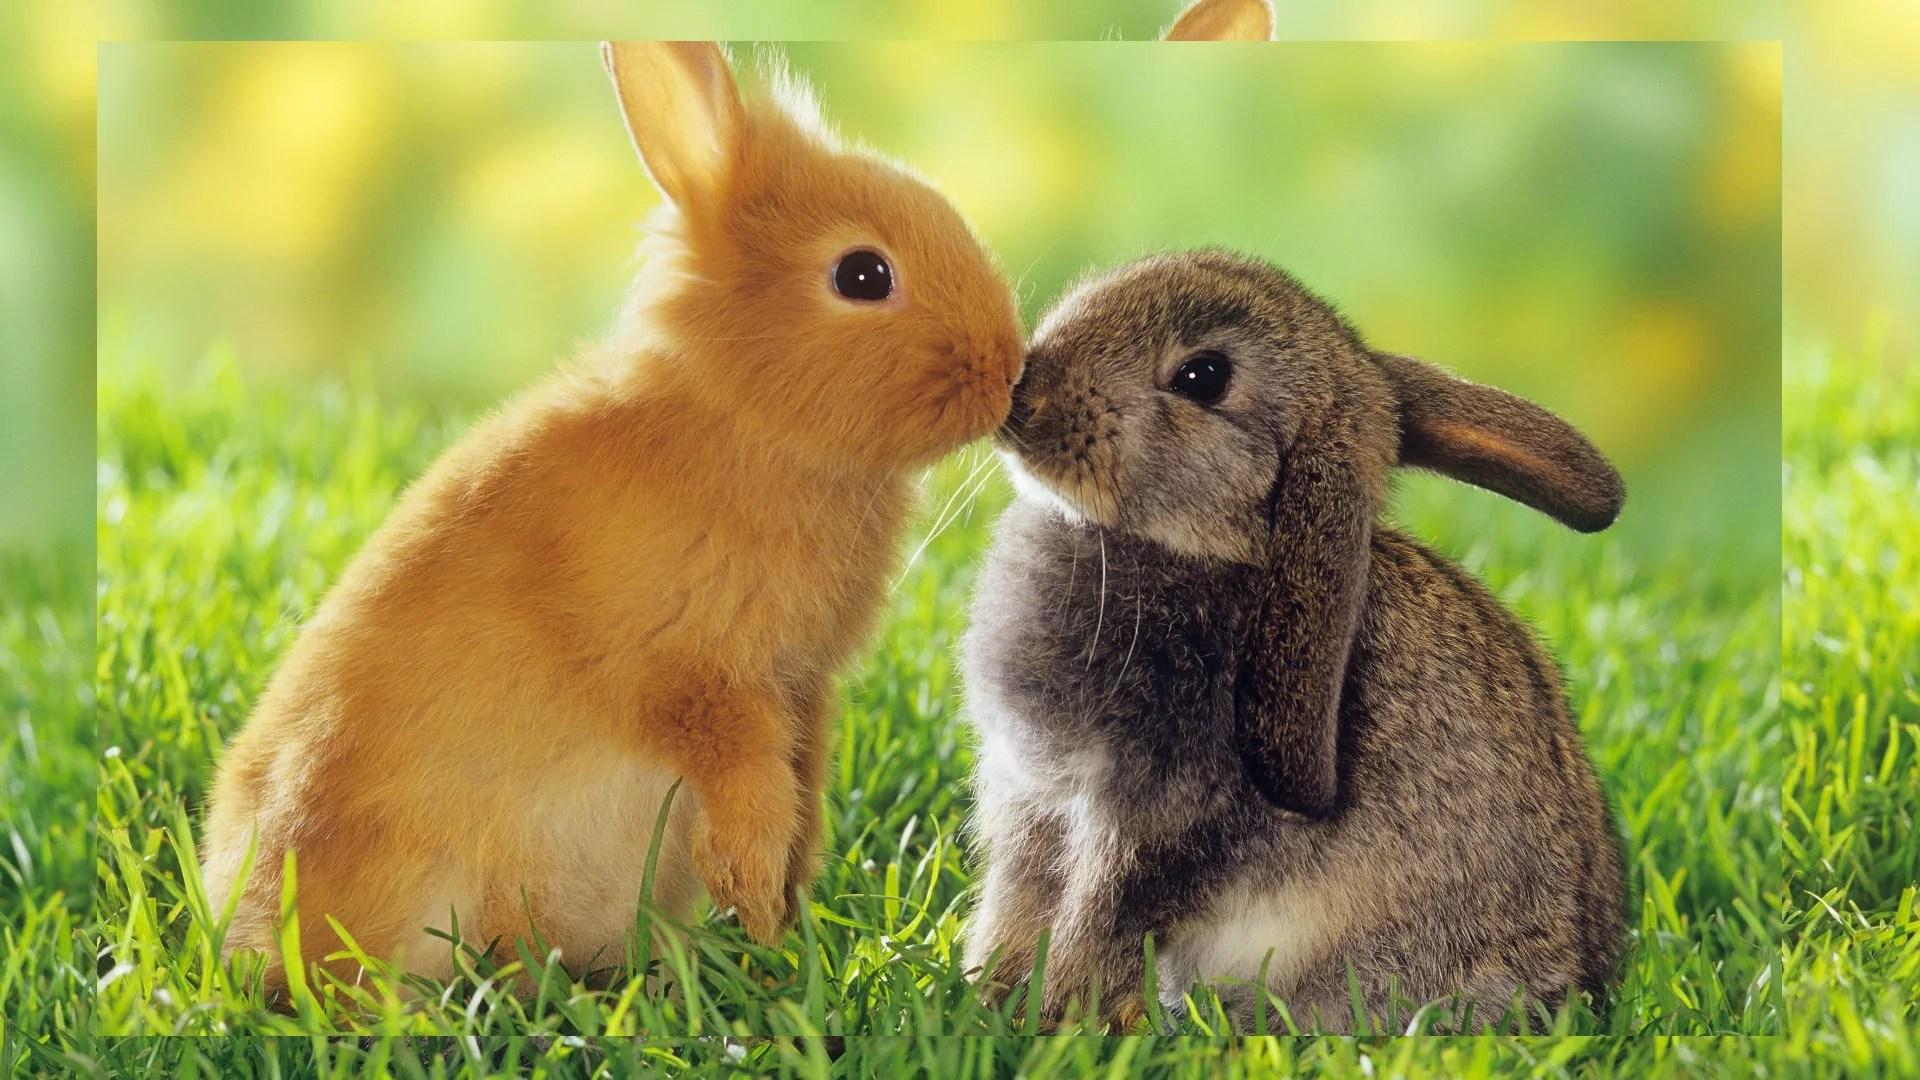 Image of: Cute Baby Love Unique Animal Wallpapers Free Download Hd Wallpapers Free Best Hd Unique Animal Wallpapers Free Download Hd Wallpapers